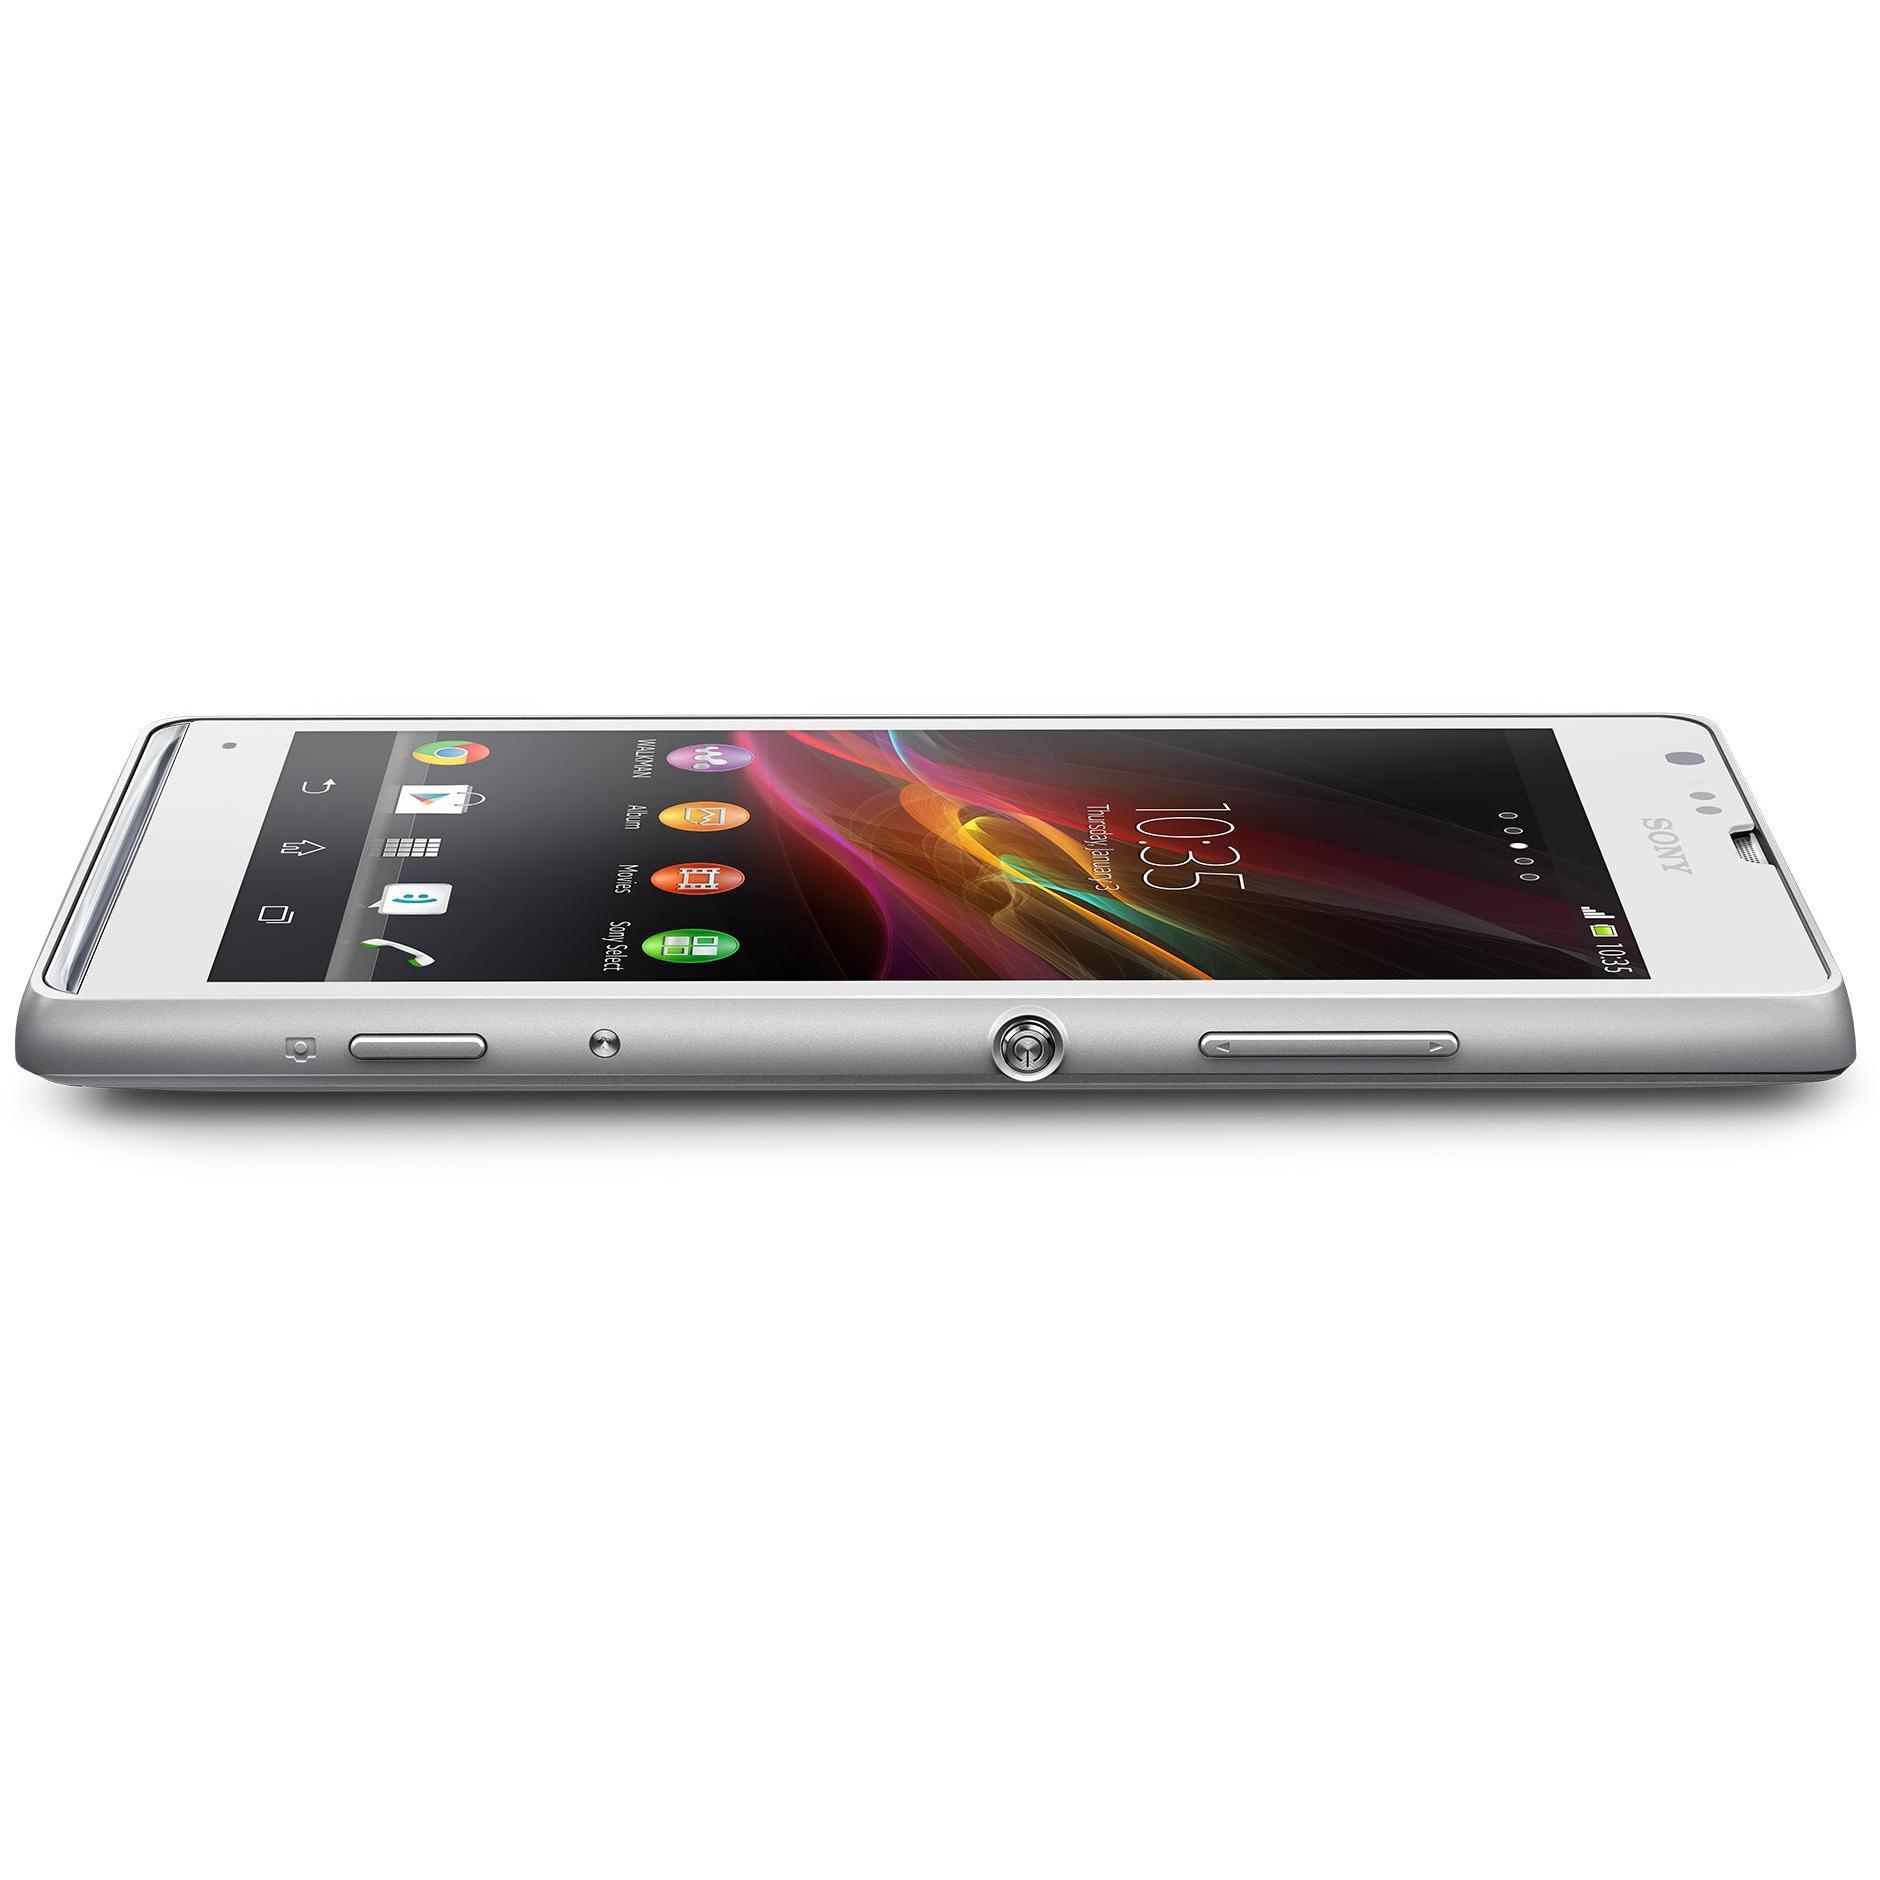 Sony Xperia SP 8 Gb - Blanco - Libre